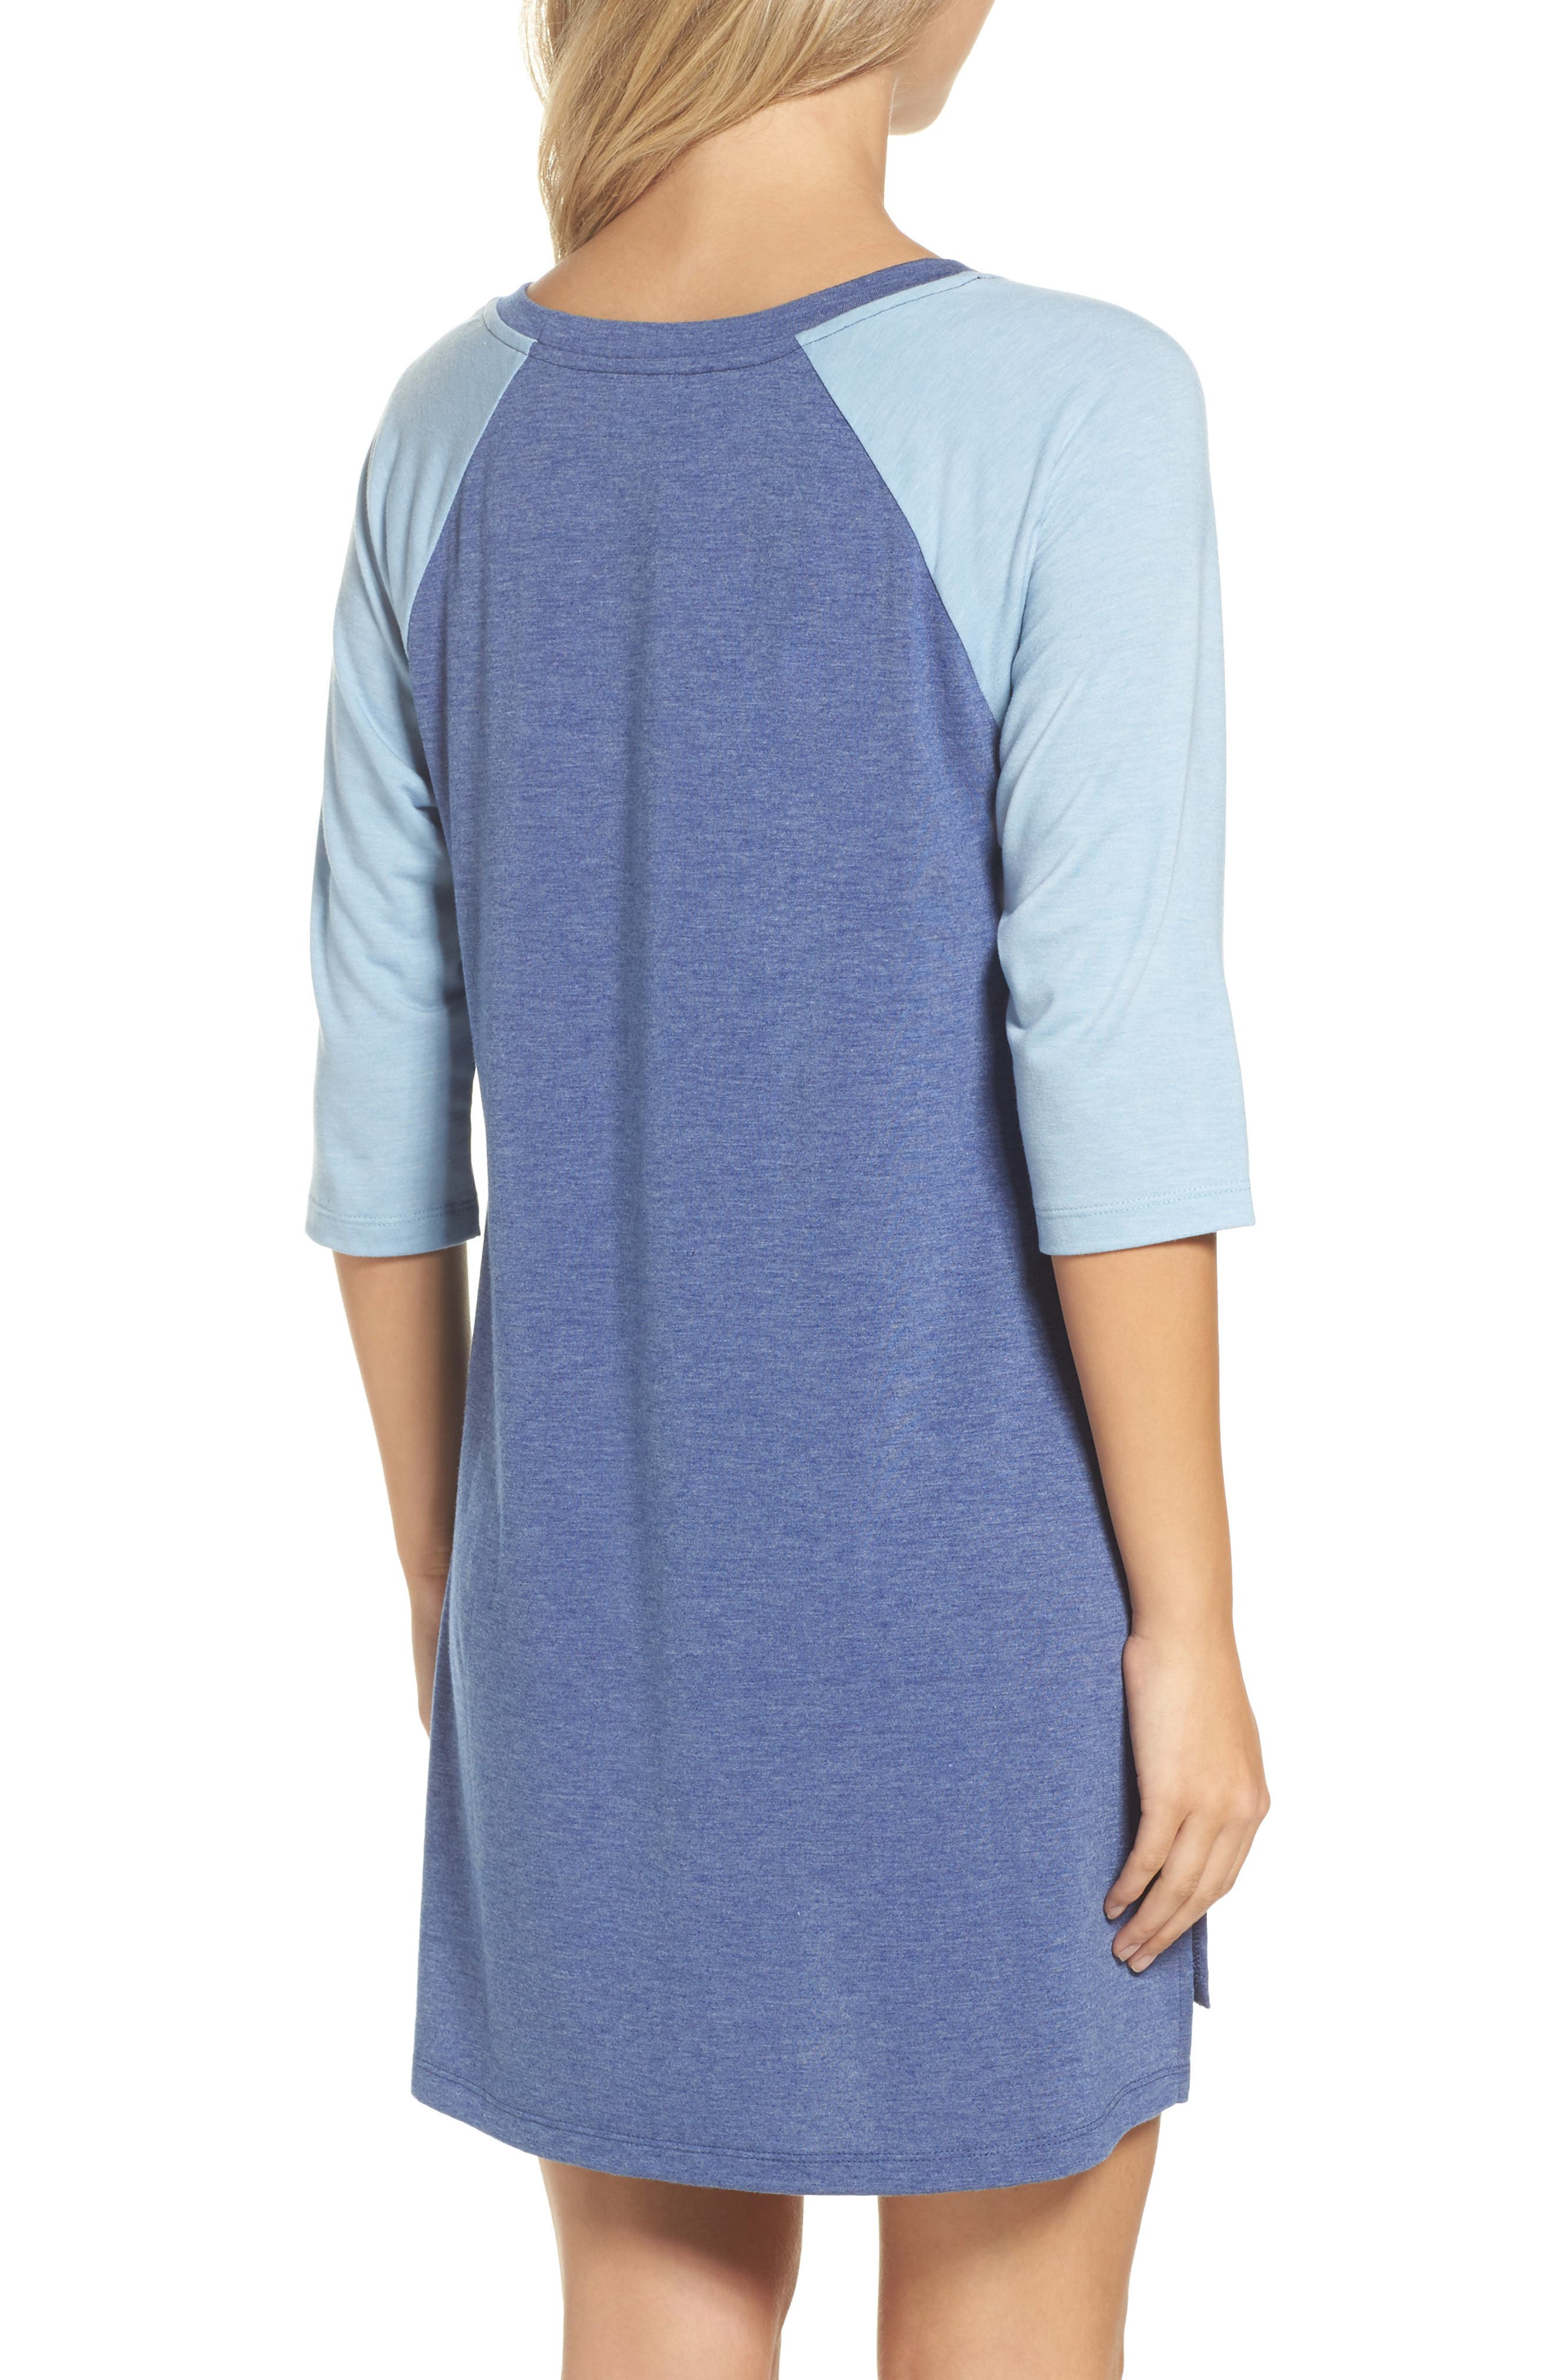 Honeydew All American Sleep Shirt,                             Alternate thumbnail 11, color,